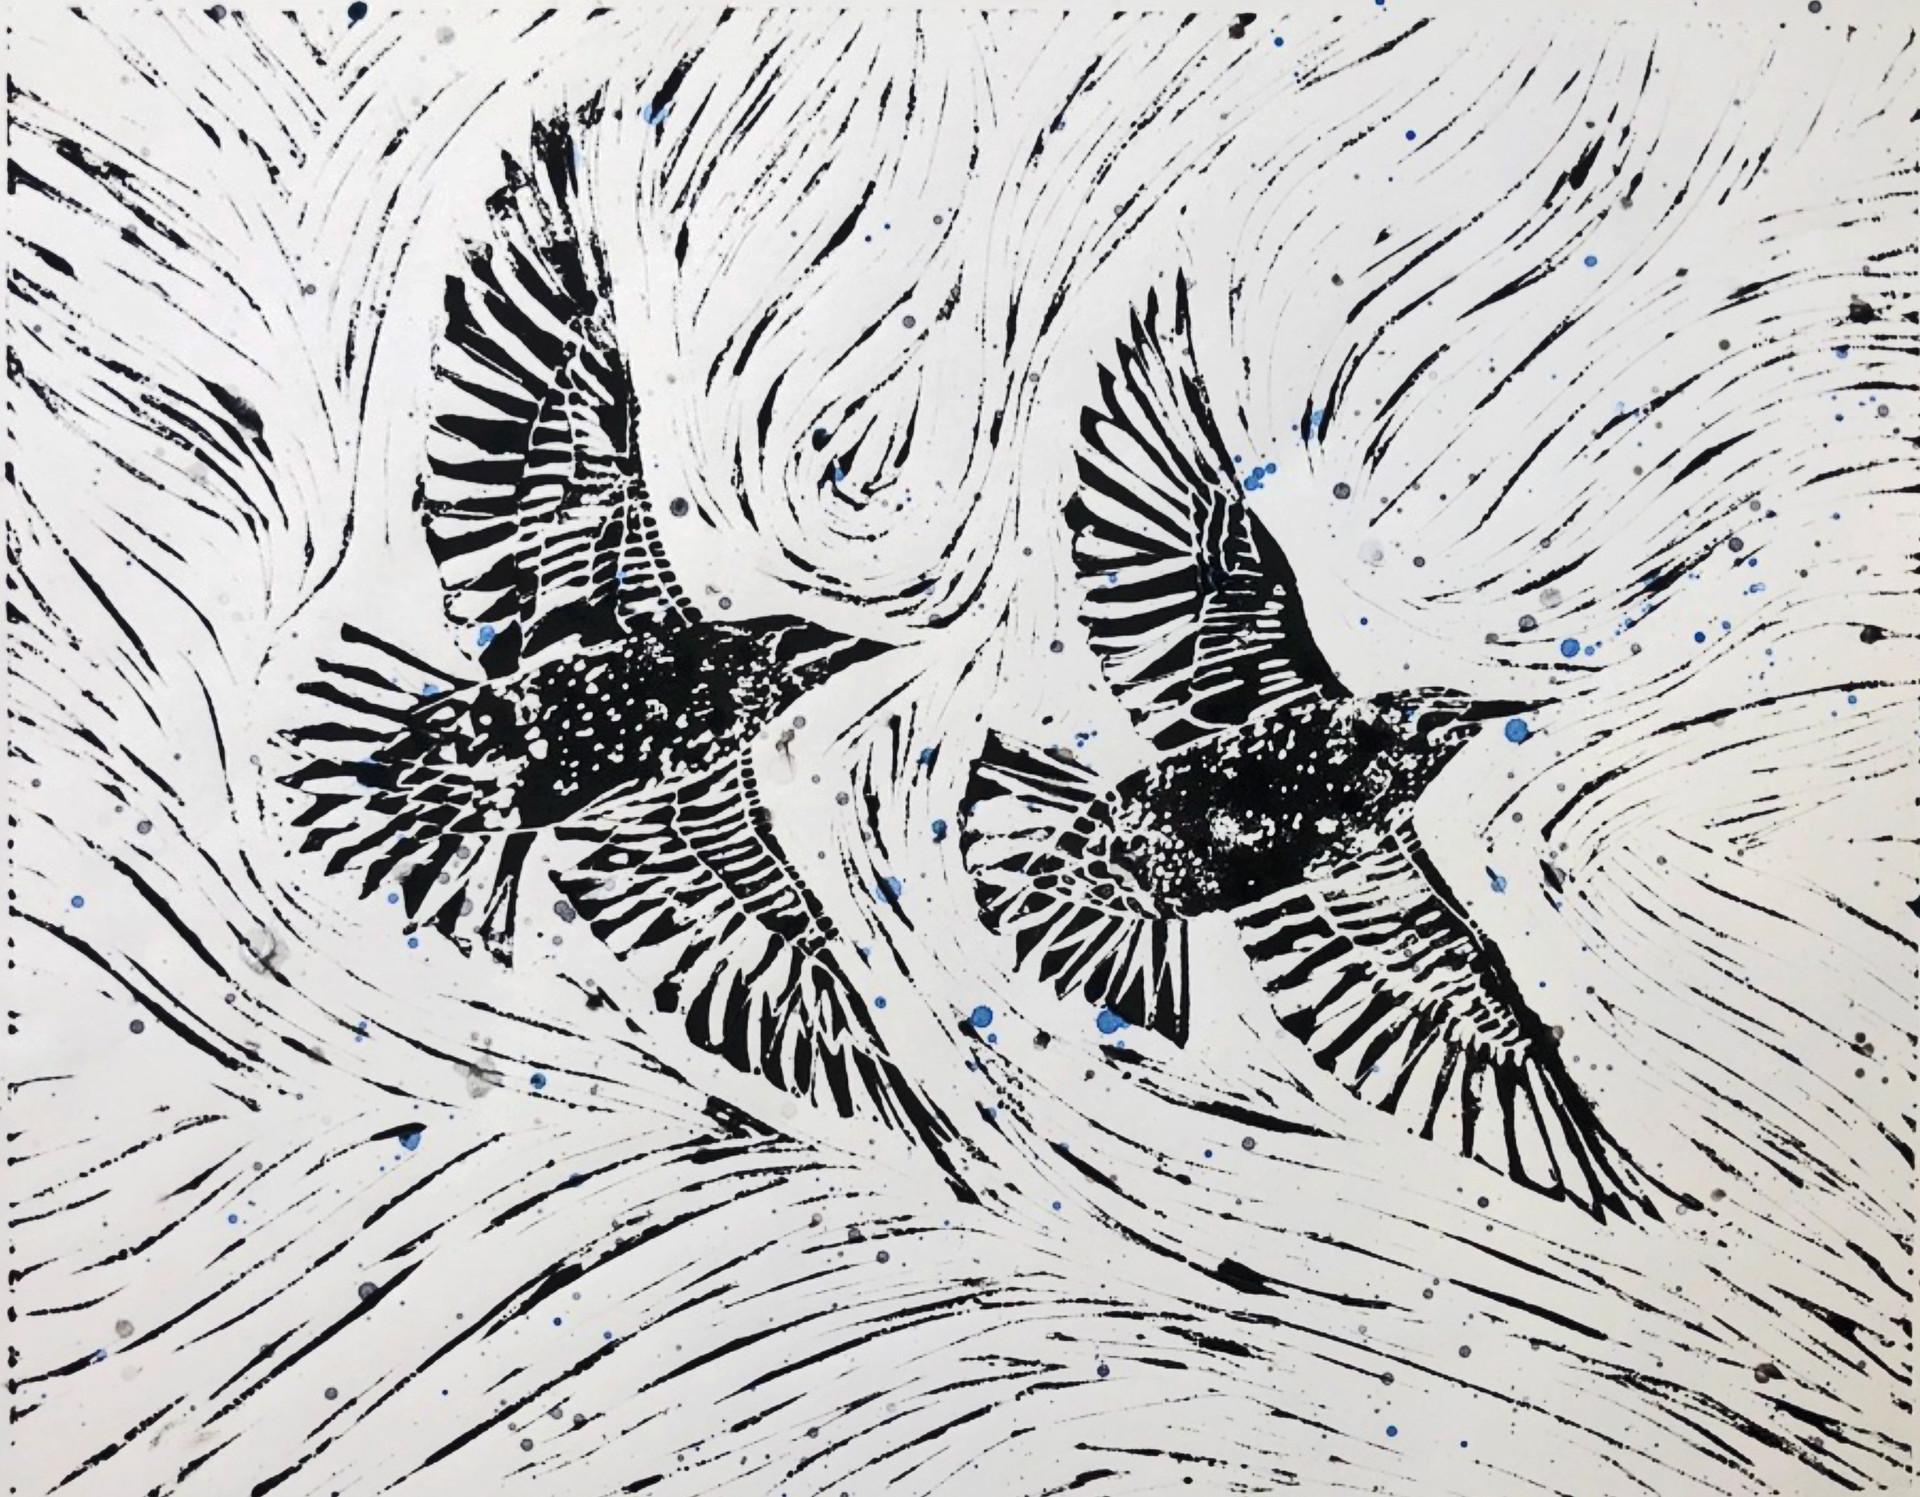 Starling #4